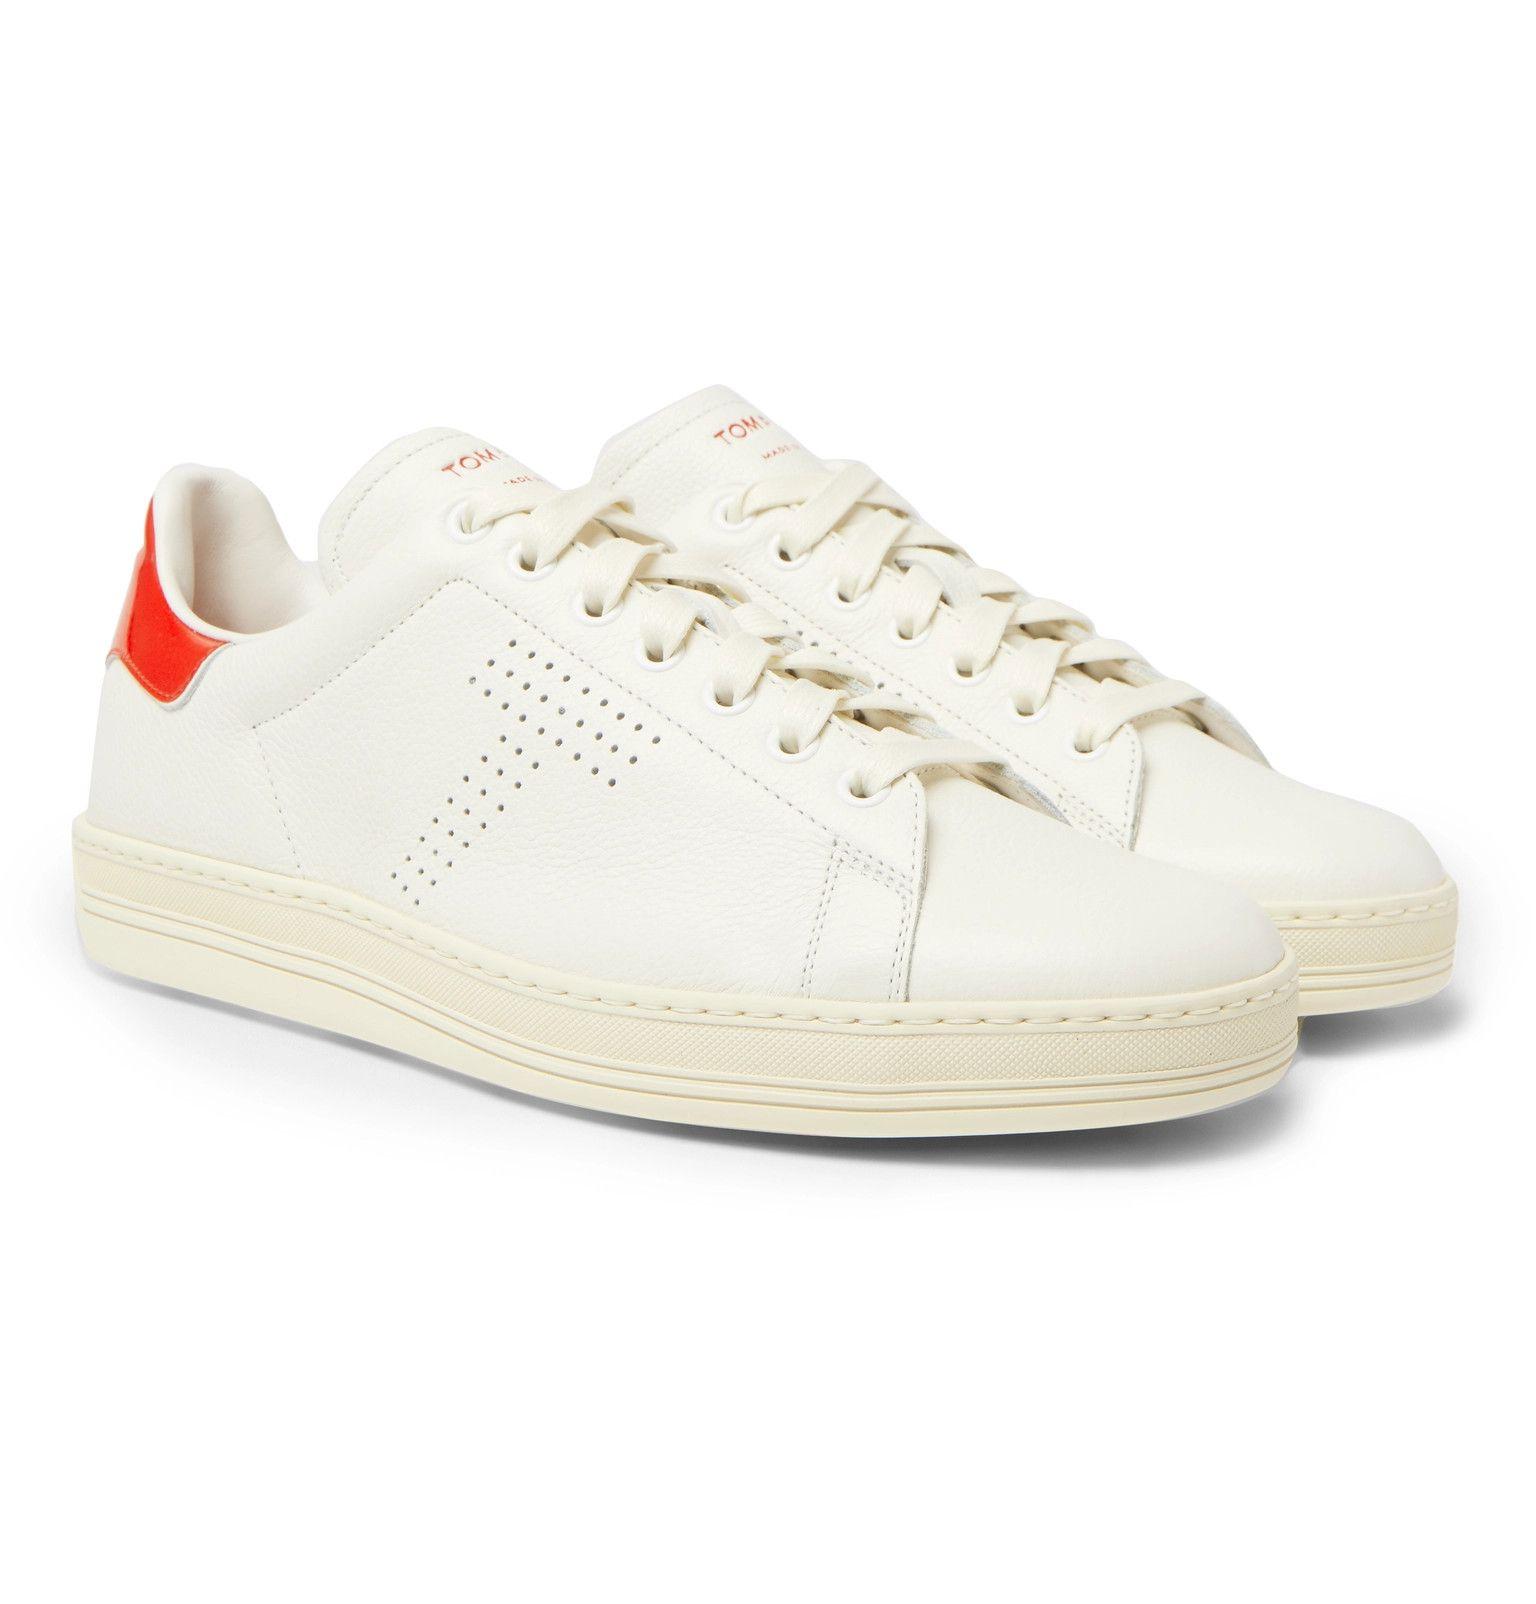 Warwick Perforated Full-grain Leather Sneakers Tom Ford oXyxg3UeU